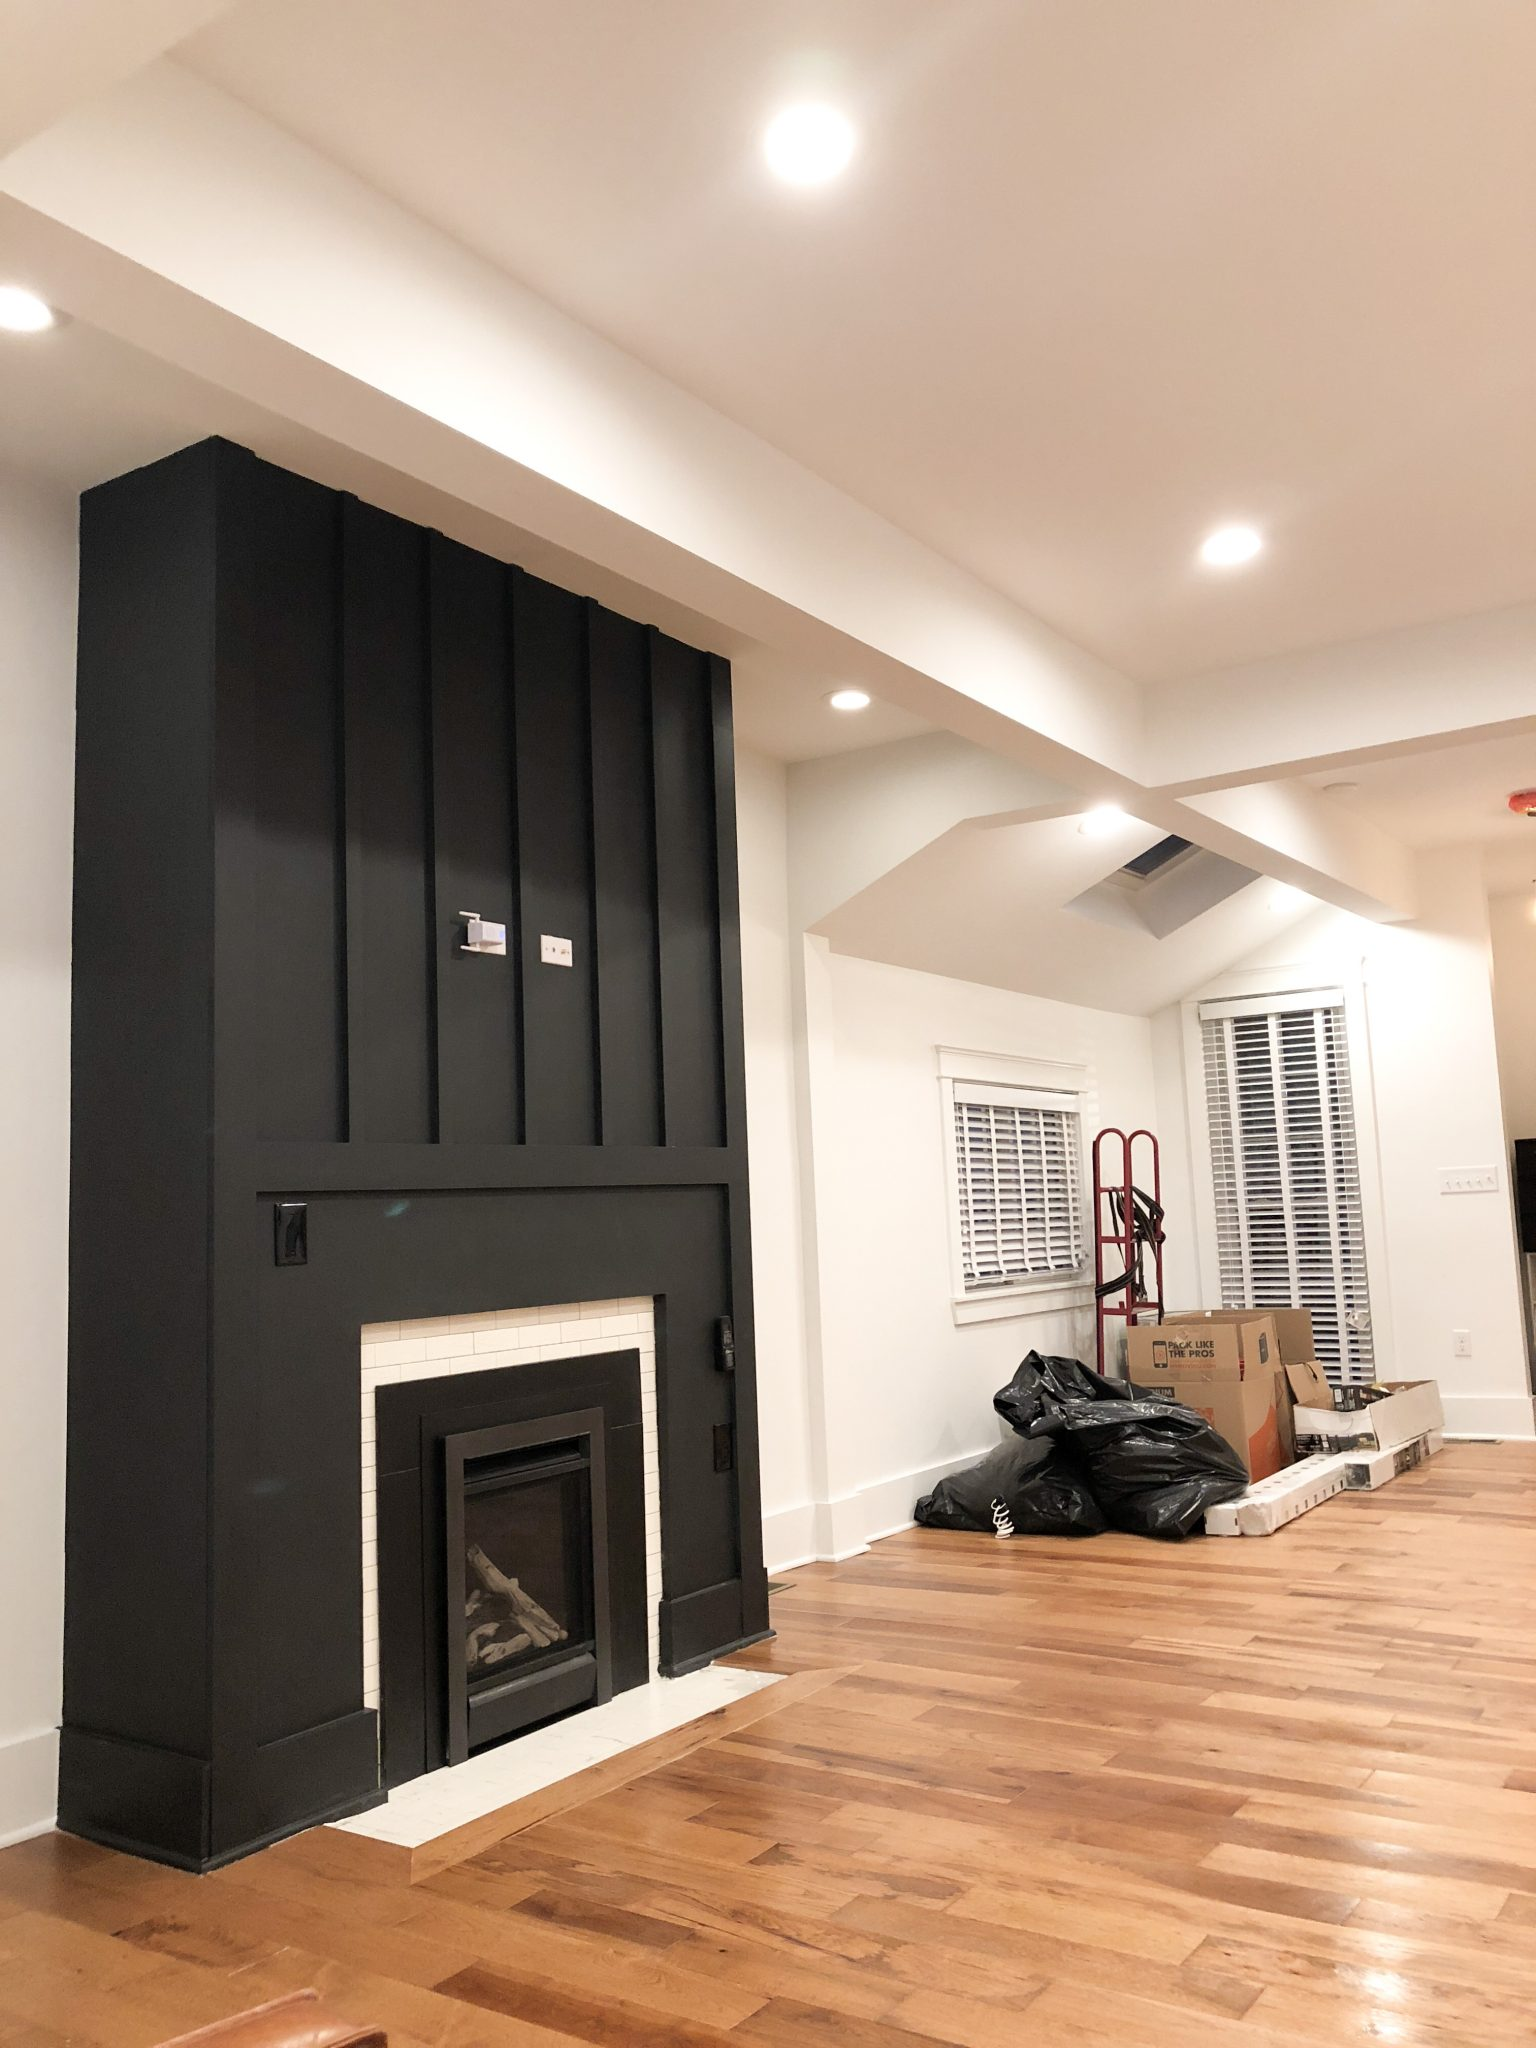 expectation vs. reality of a home renovation